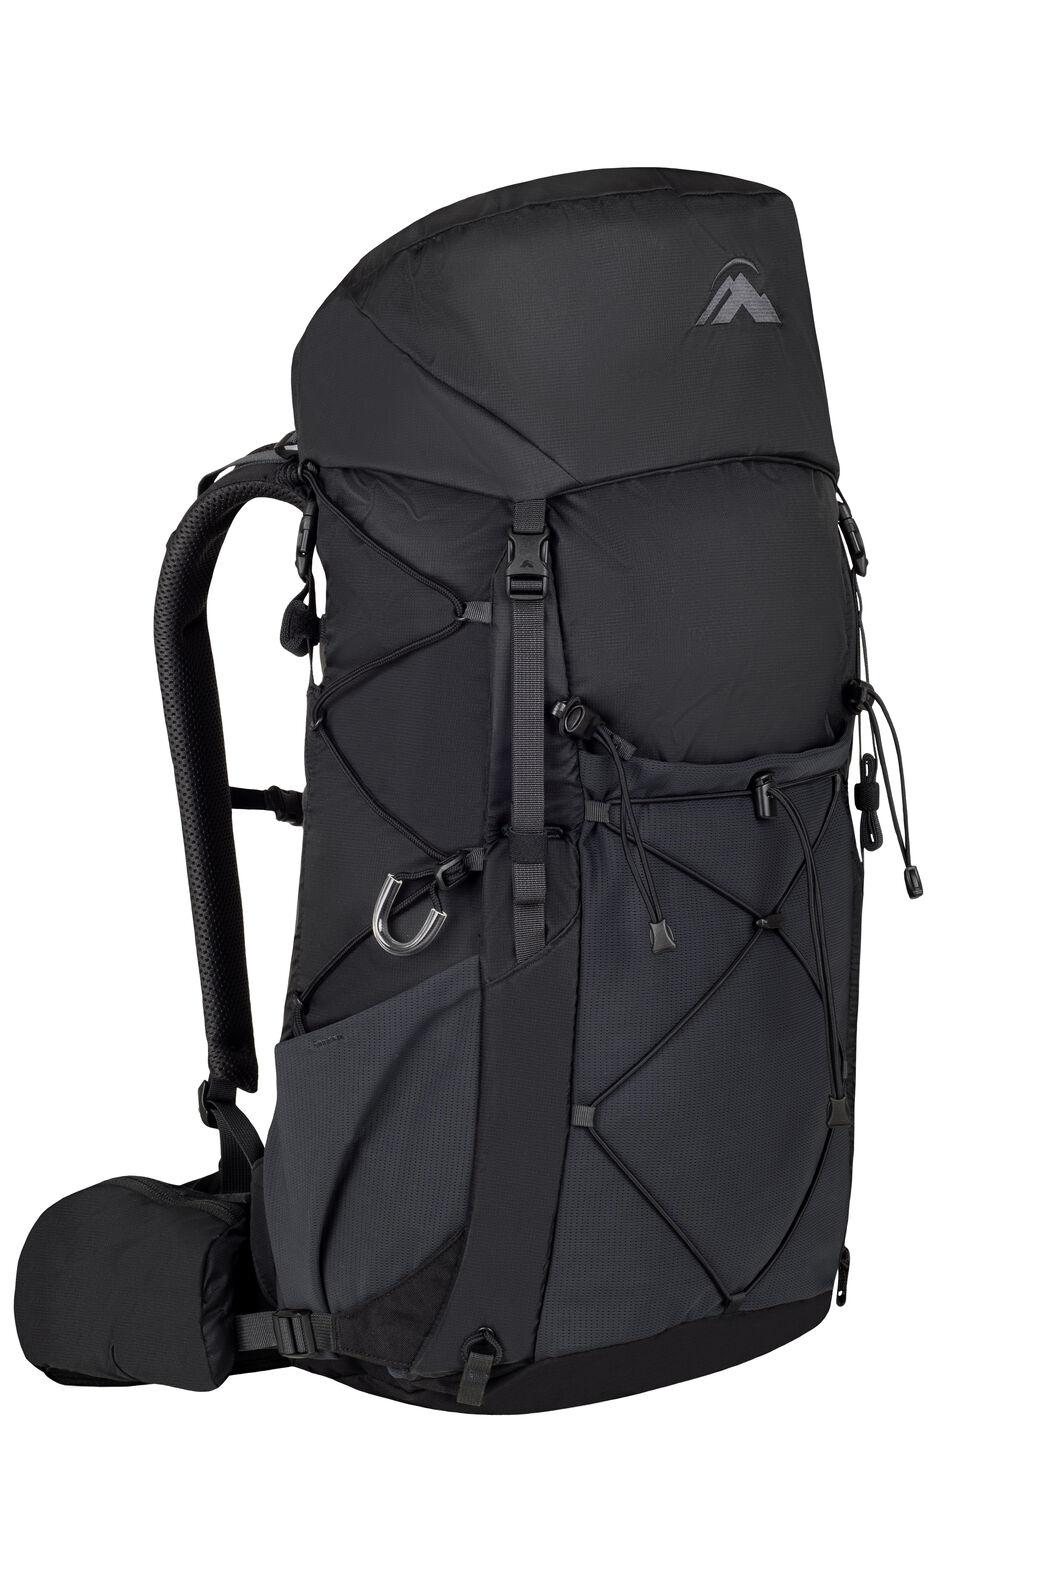 Macpac Fiord 1.1 40L Pack, Black/Black, hi-res